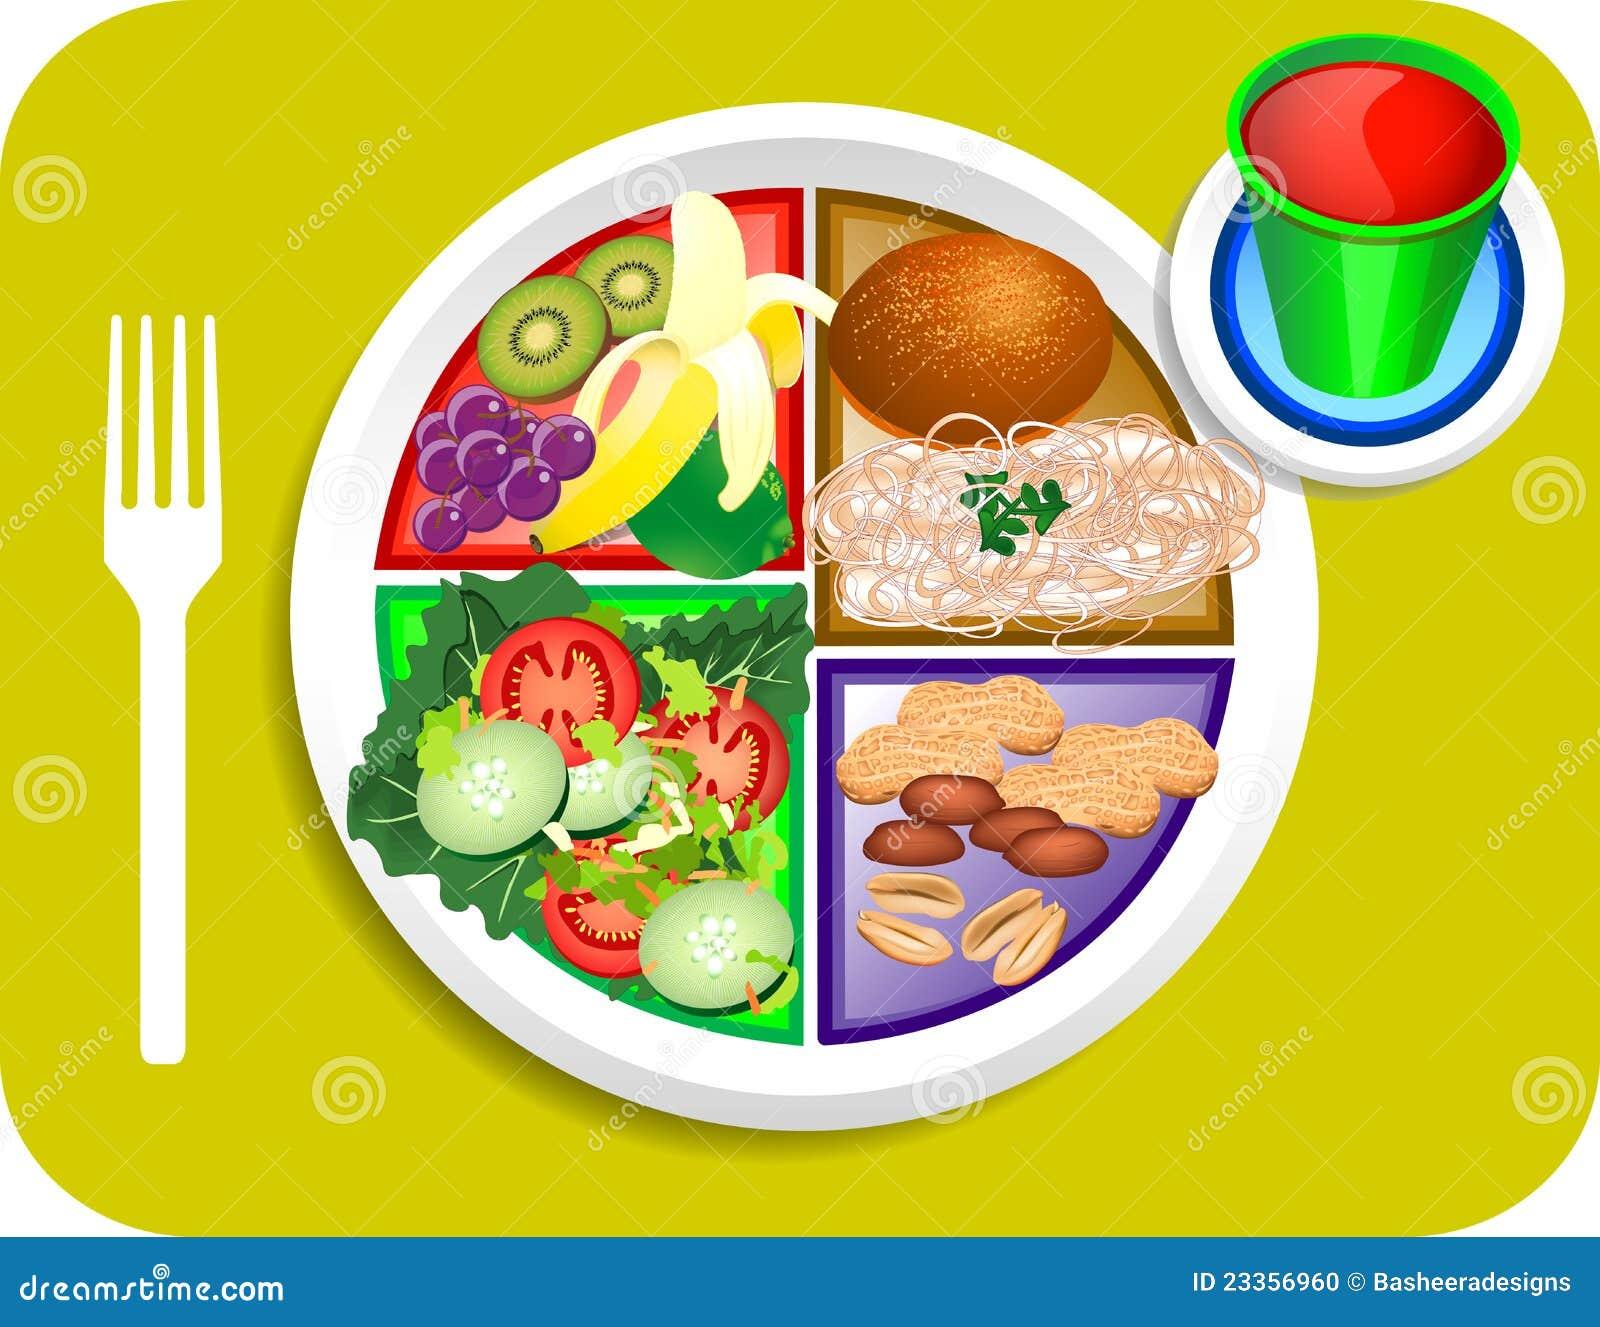 Blue Menu Food Items